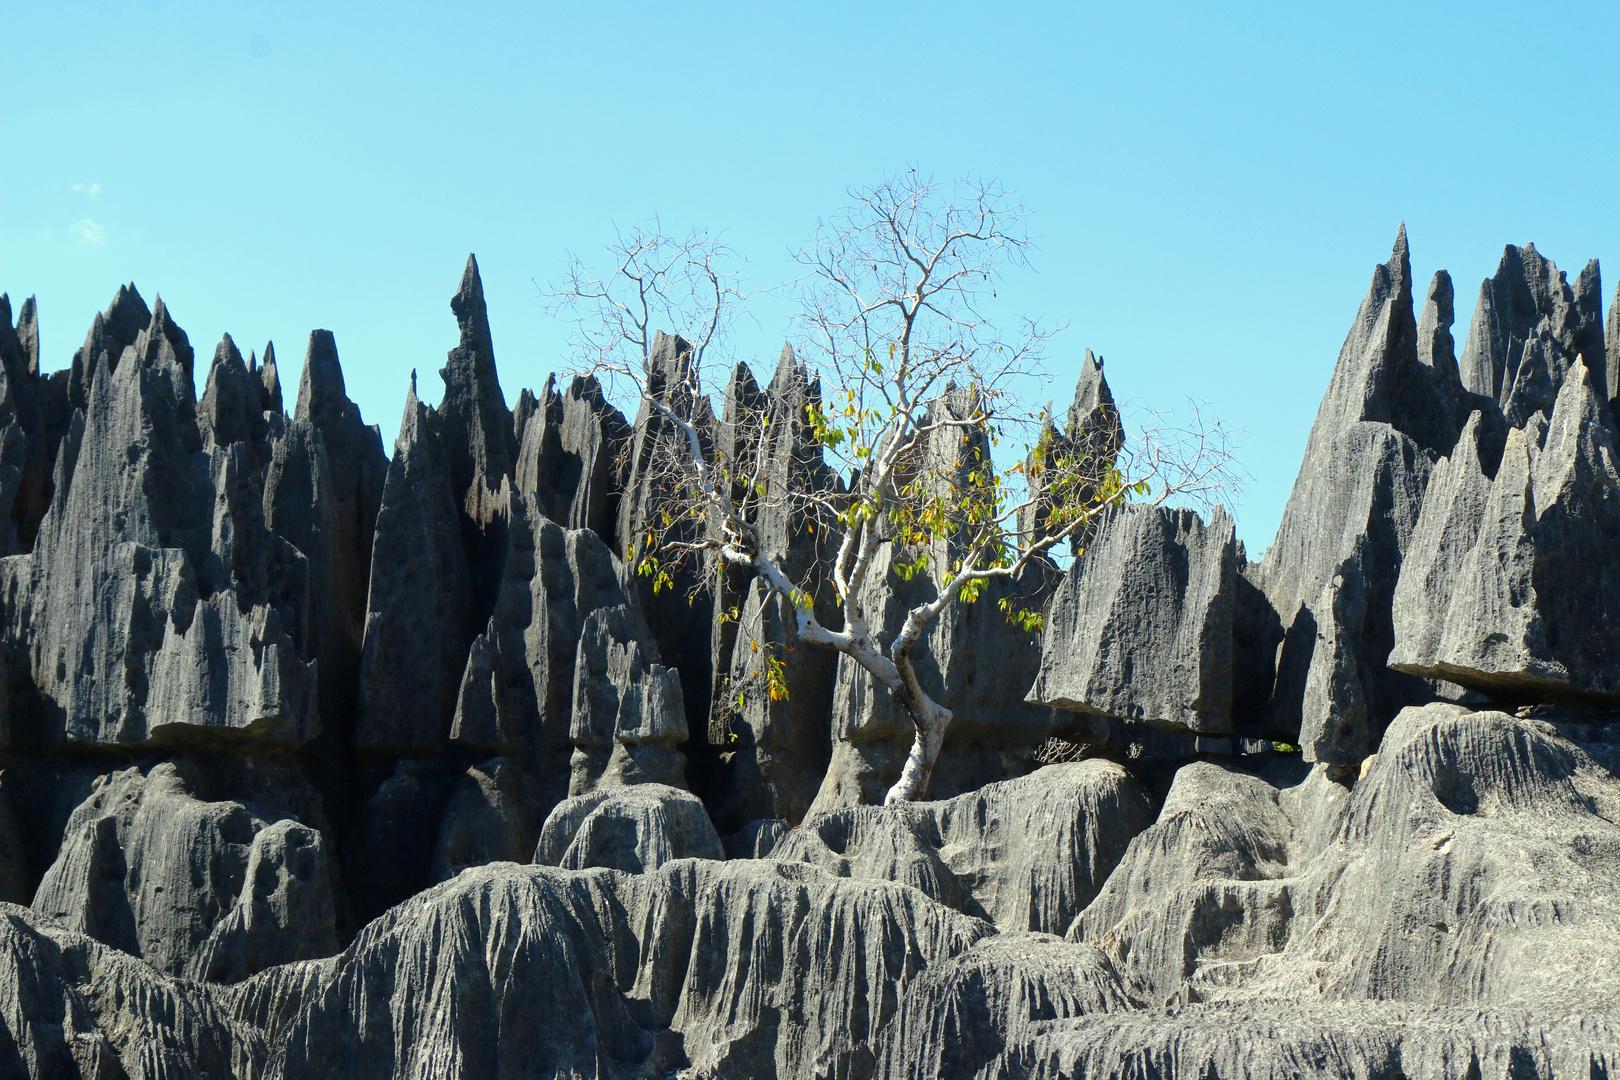 un arbre s'accroche aux Tsingy